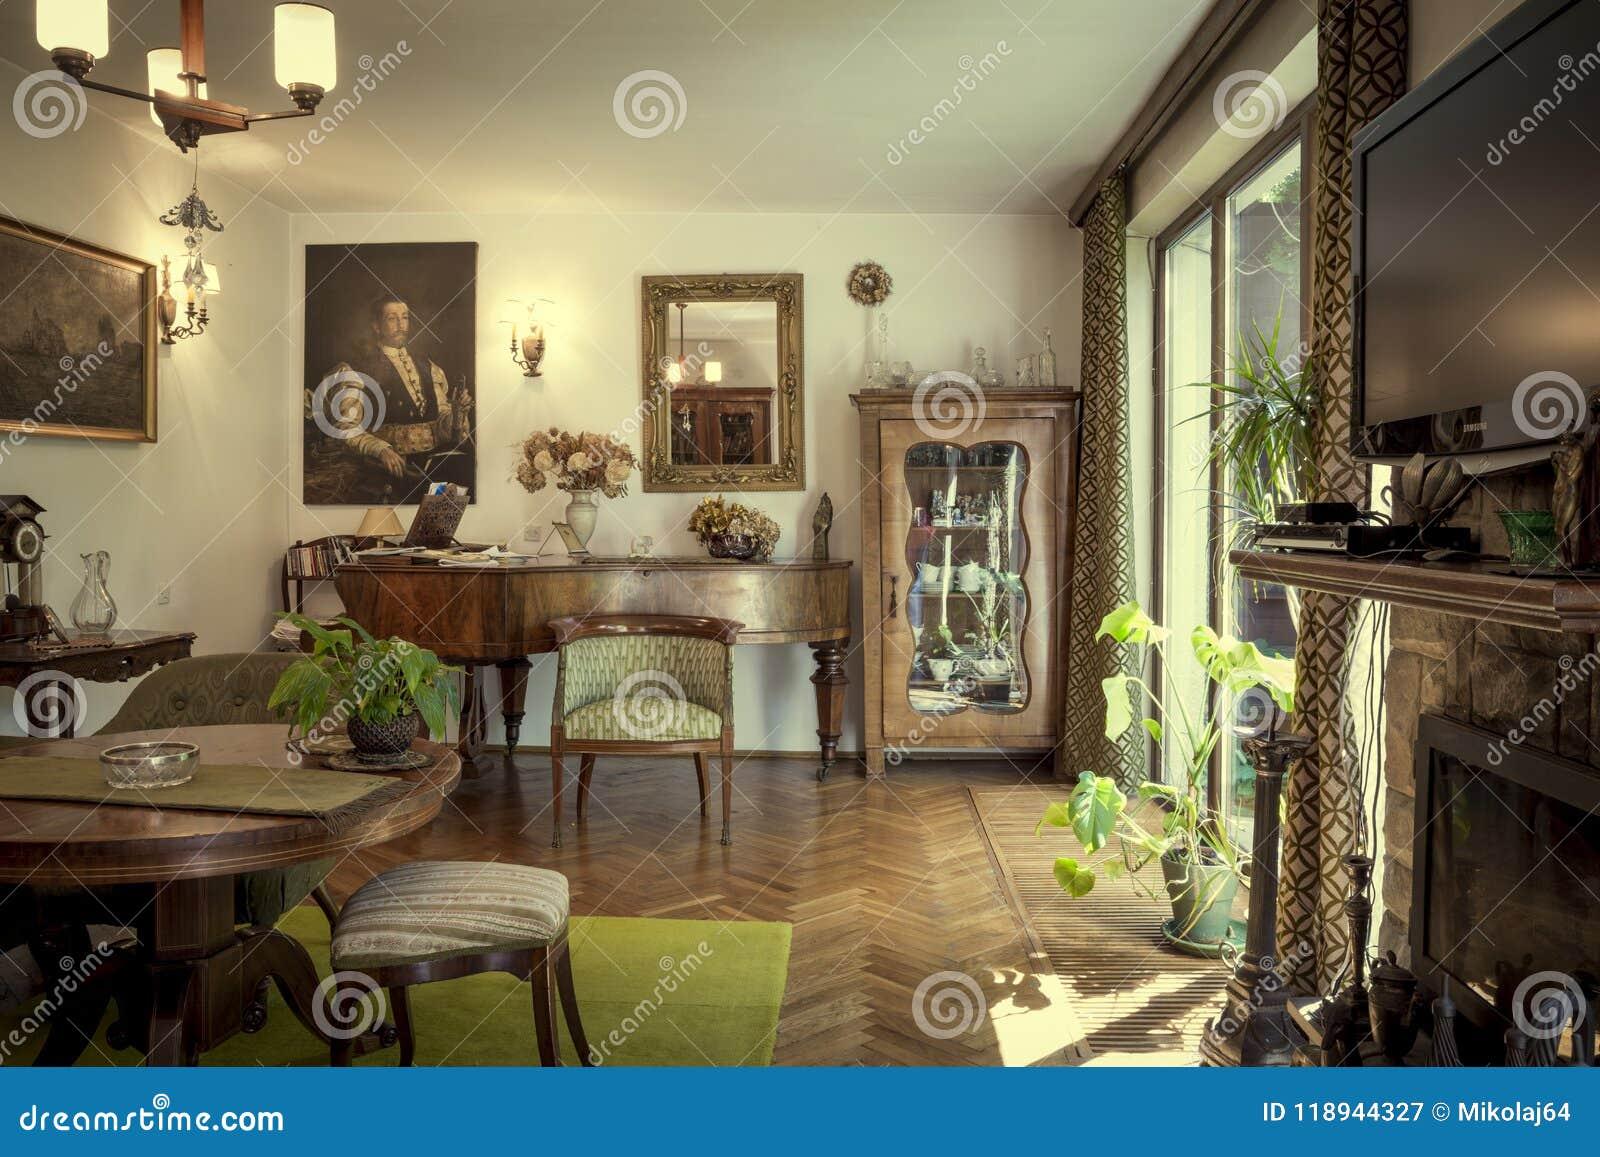 Krakow, Poland   July 3, 2014: Living Room Interior Of A House Full Of  Antiques In Krakow, Poland